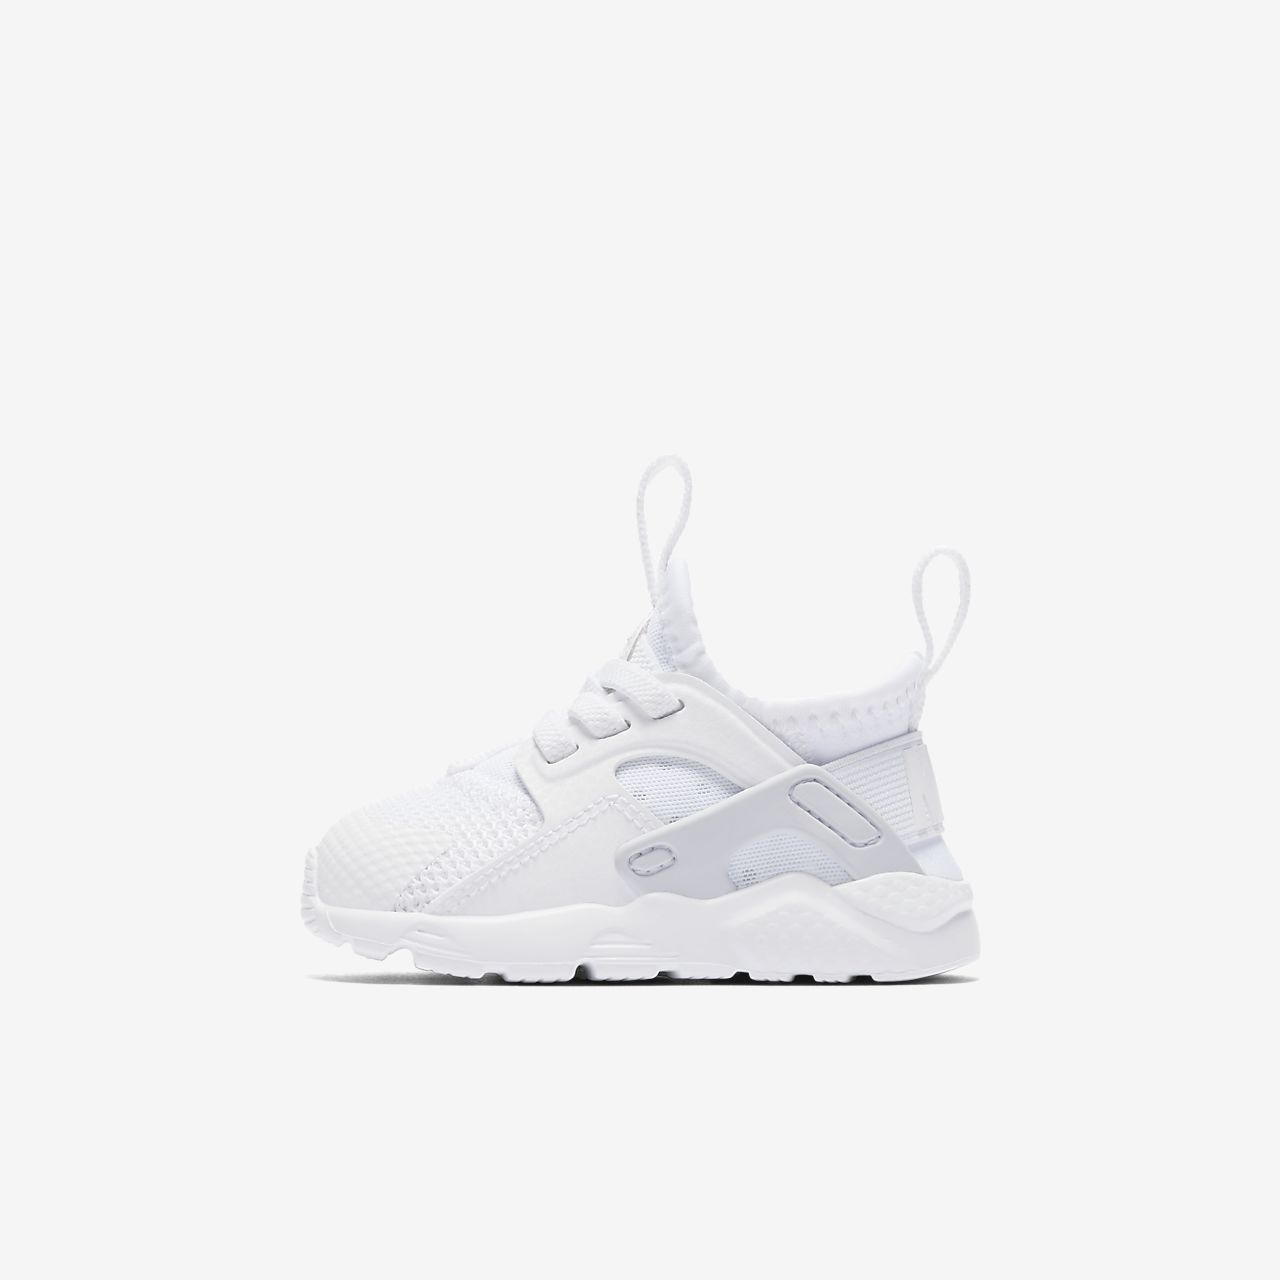 Chaussure Nike Huarache Ultra pour Petit enfant